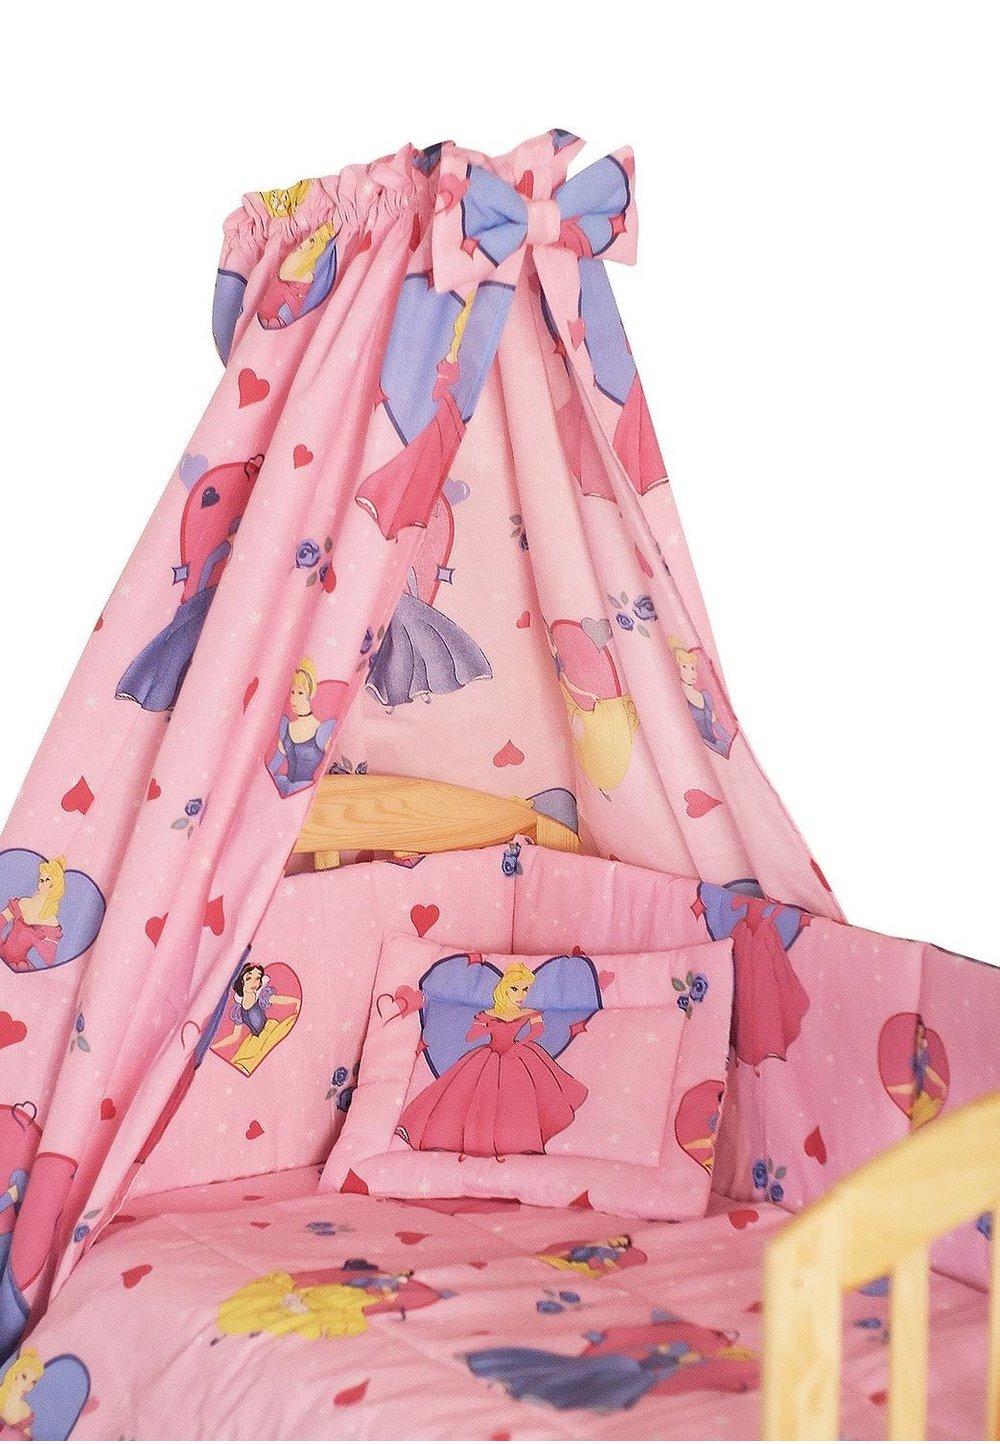 Lenjerie cu baldachin, 6 piese, Printese roz 120x60 cm imagine